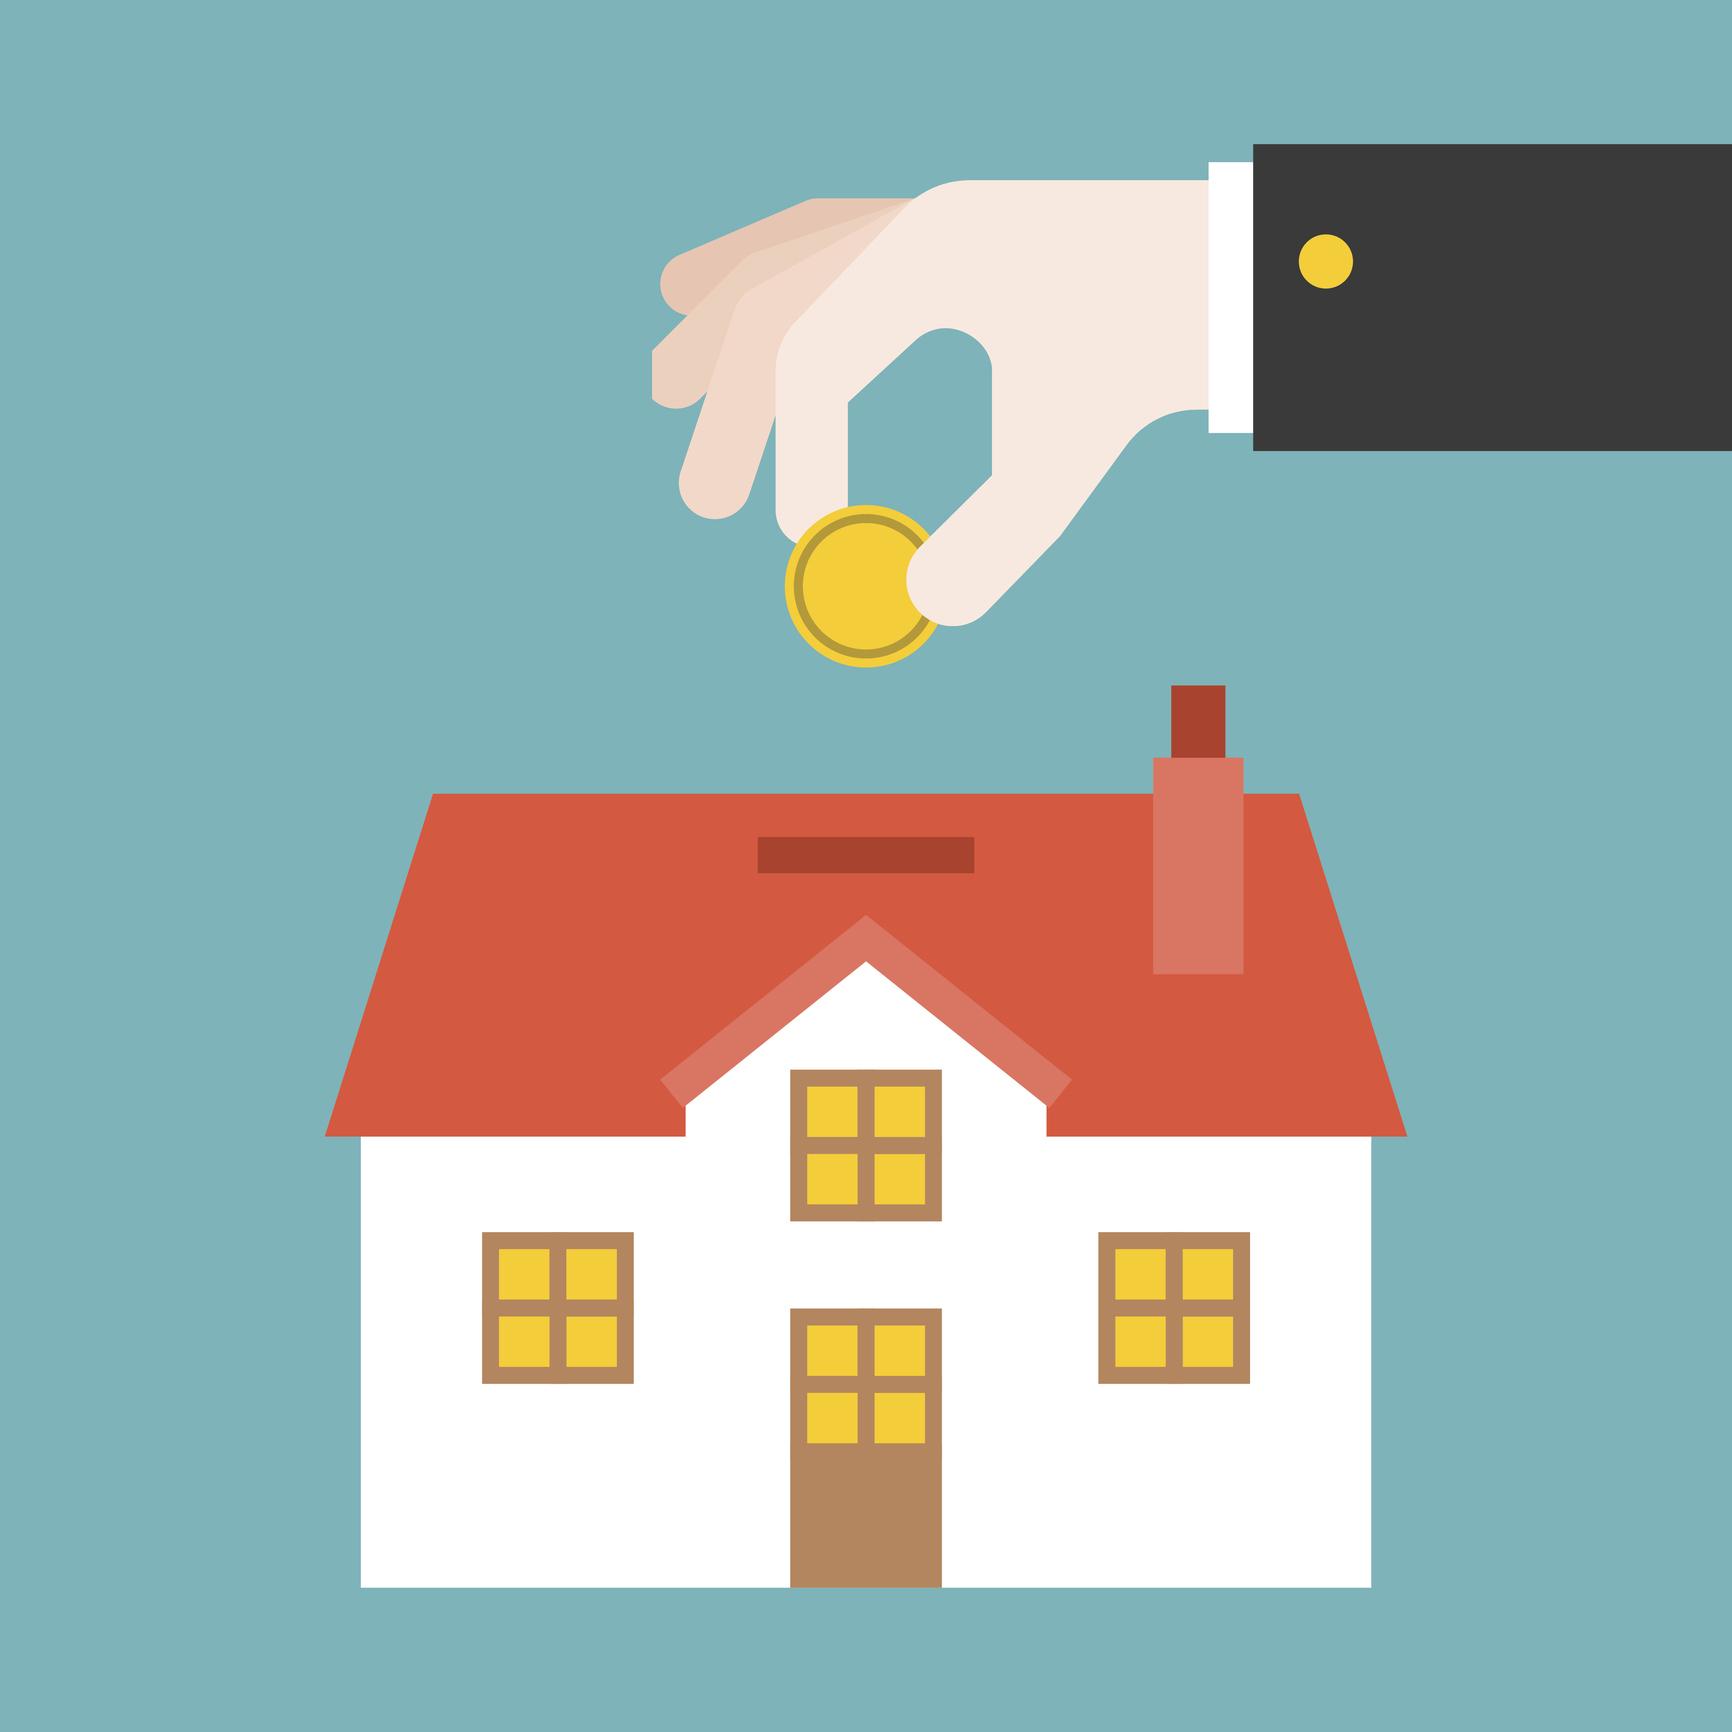 Comparatif assurance : quels sont les inconvénients d'un comparatif assurance ?